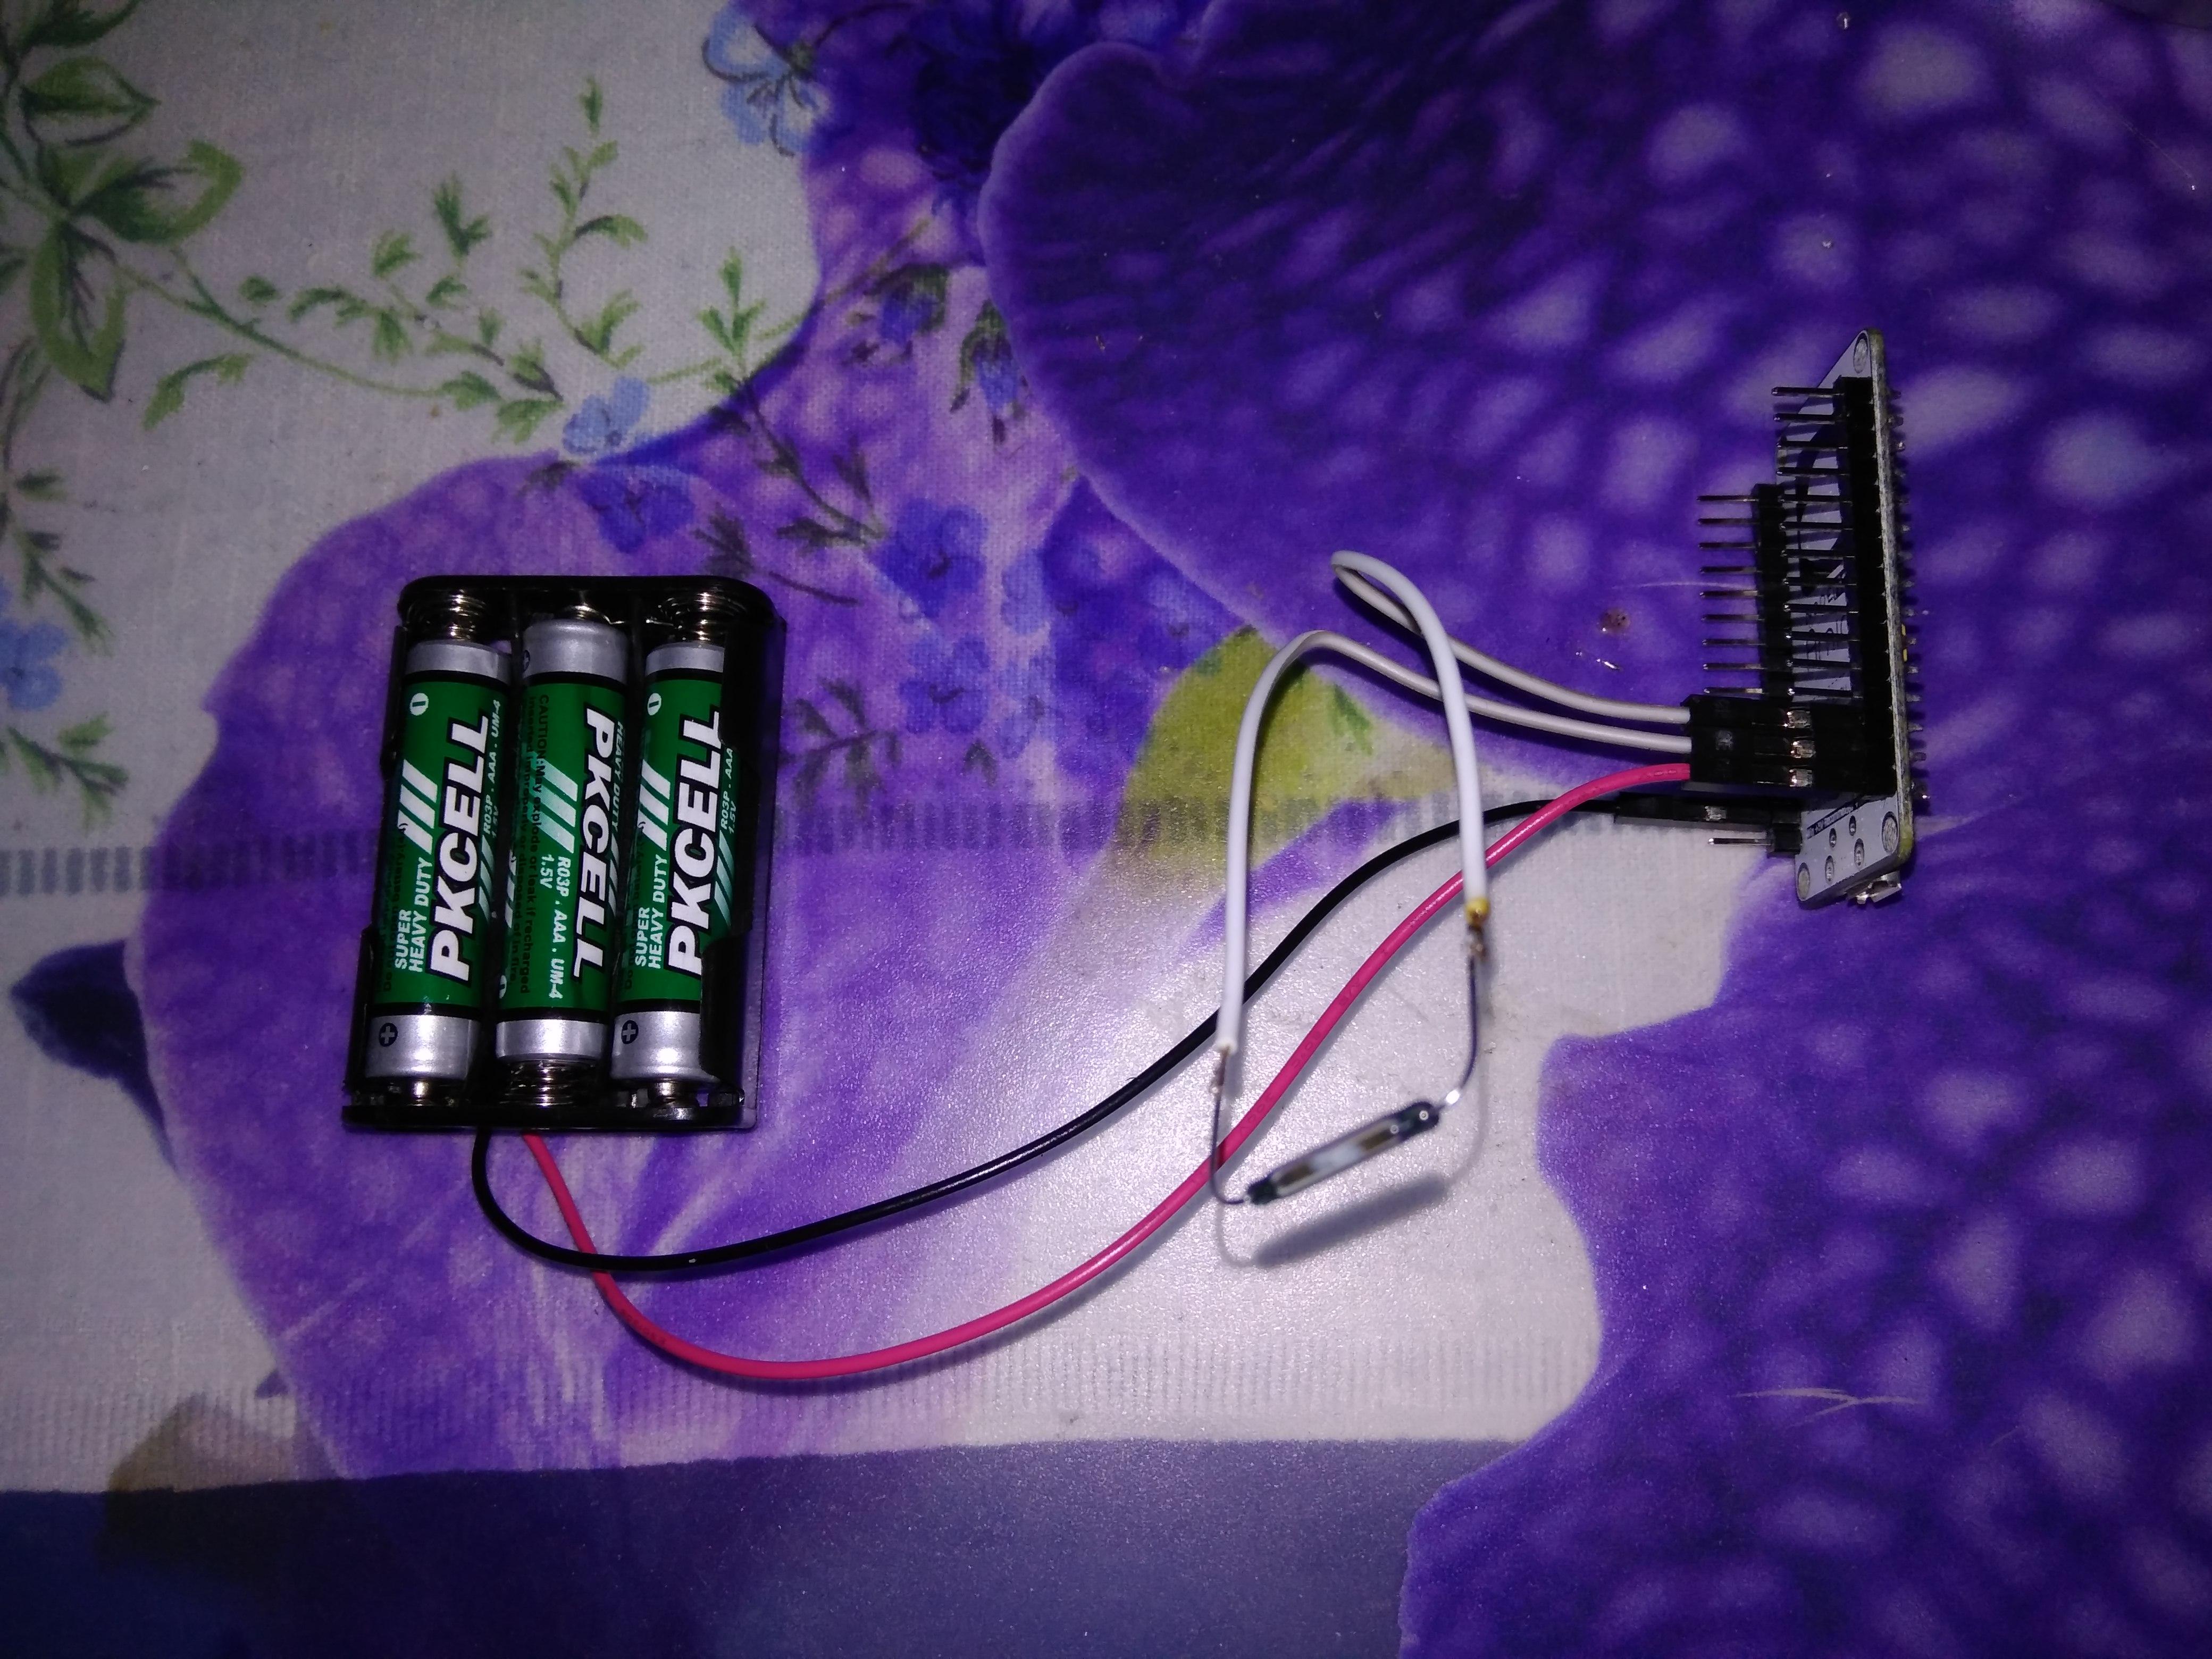 Smart energy meter | danman's blog